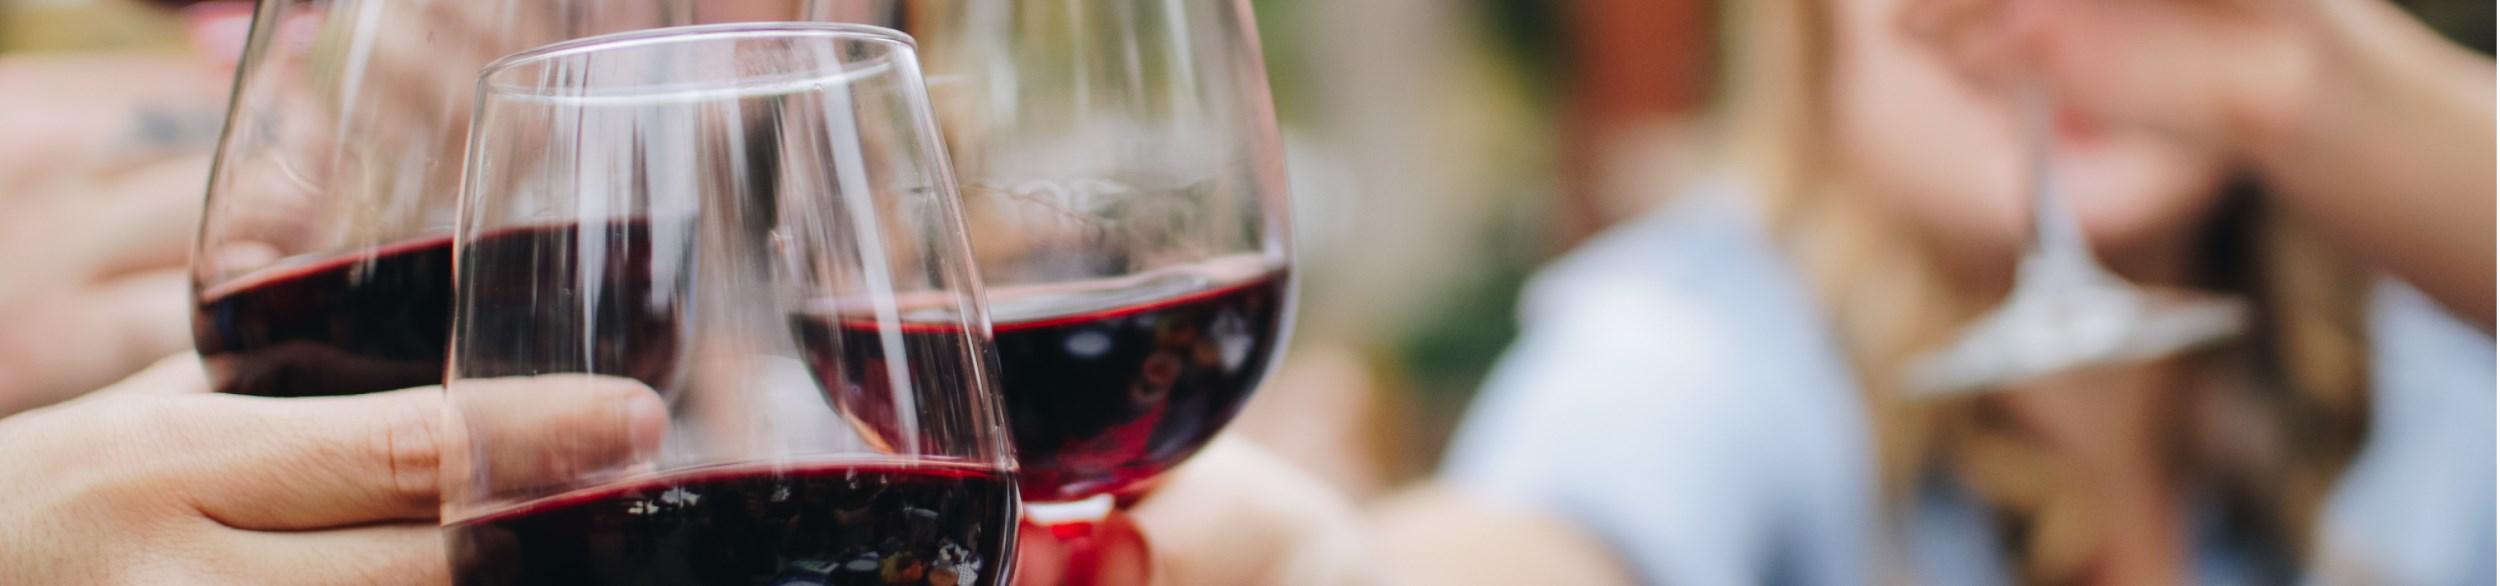 Wine & Wineries Tours